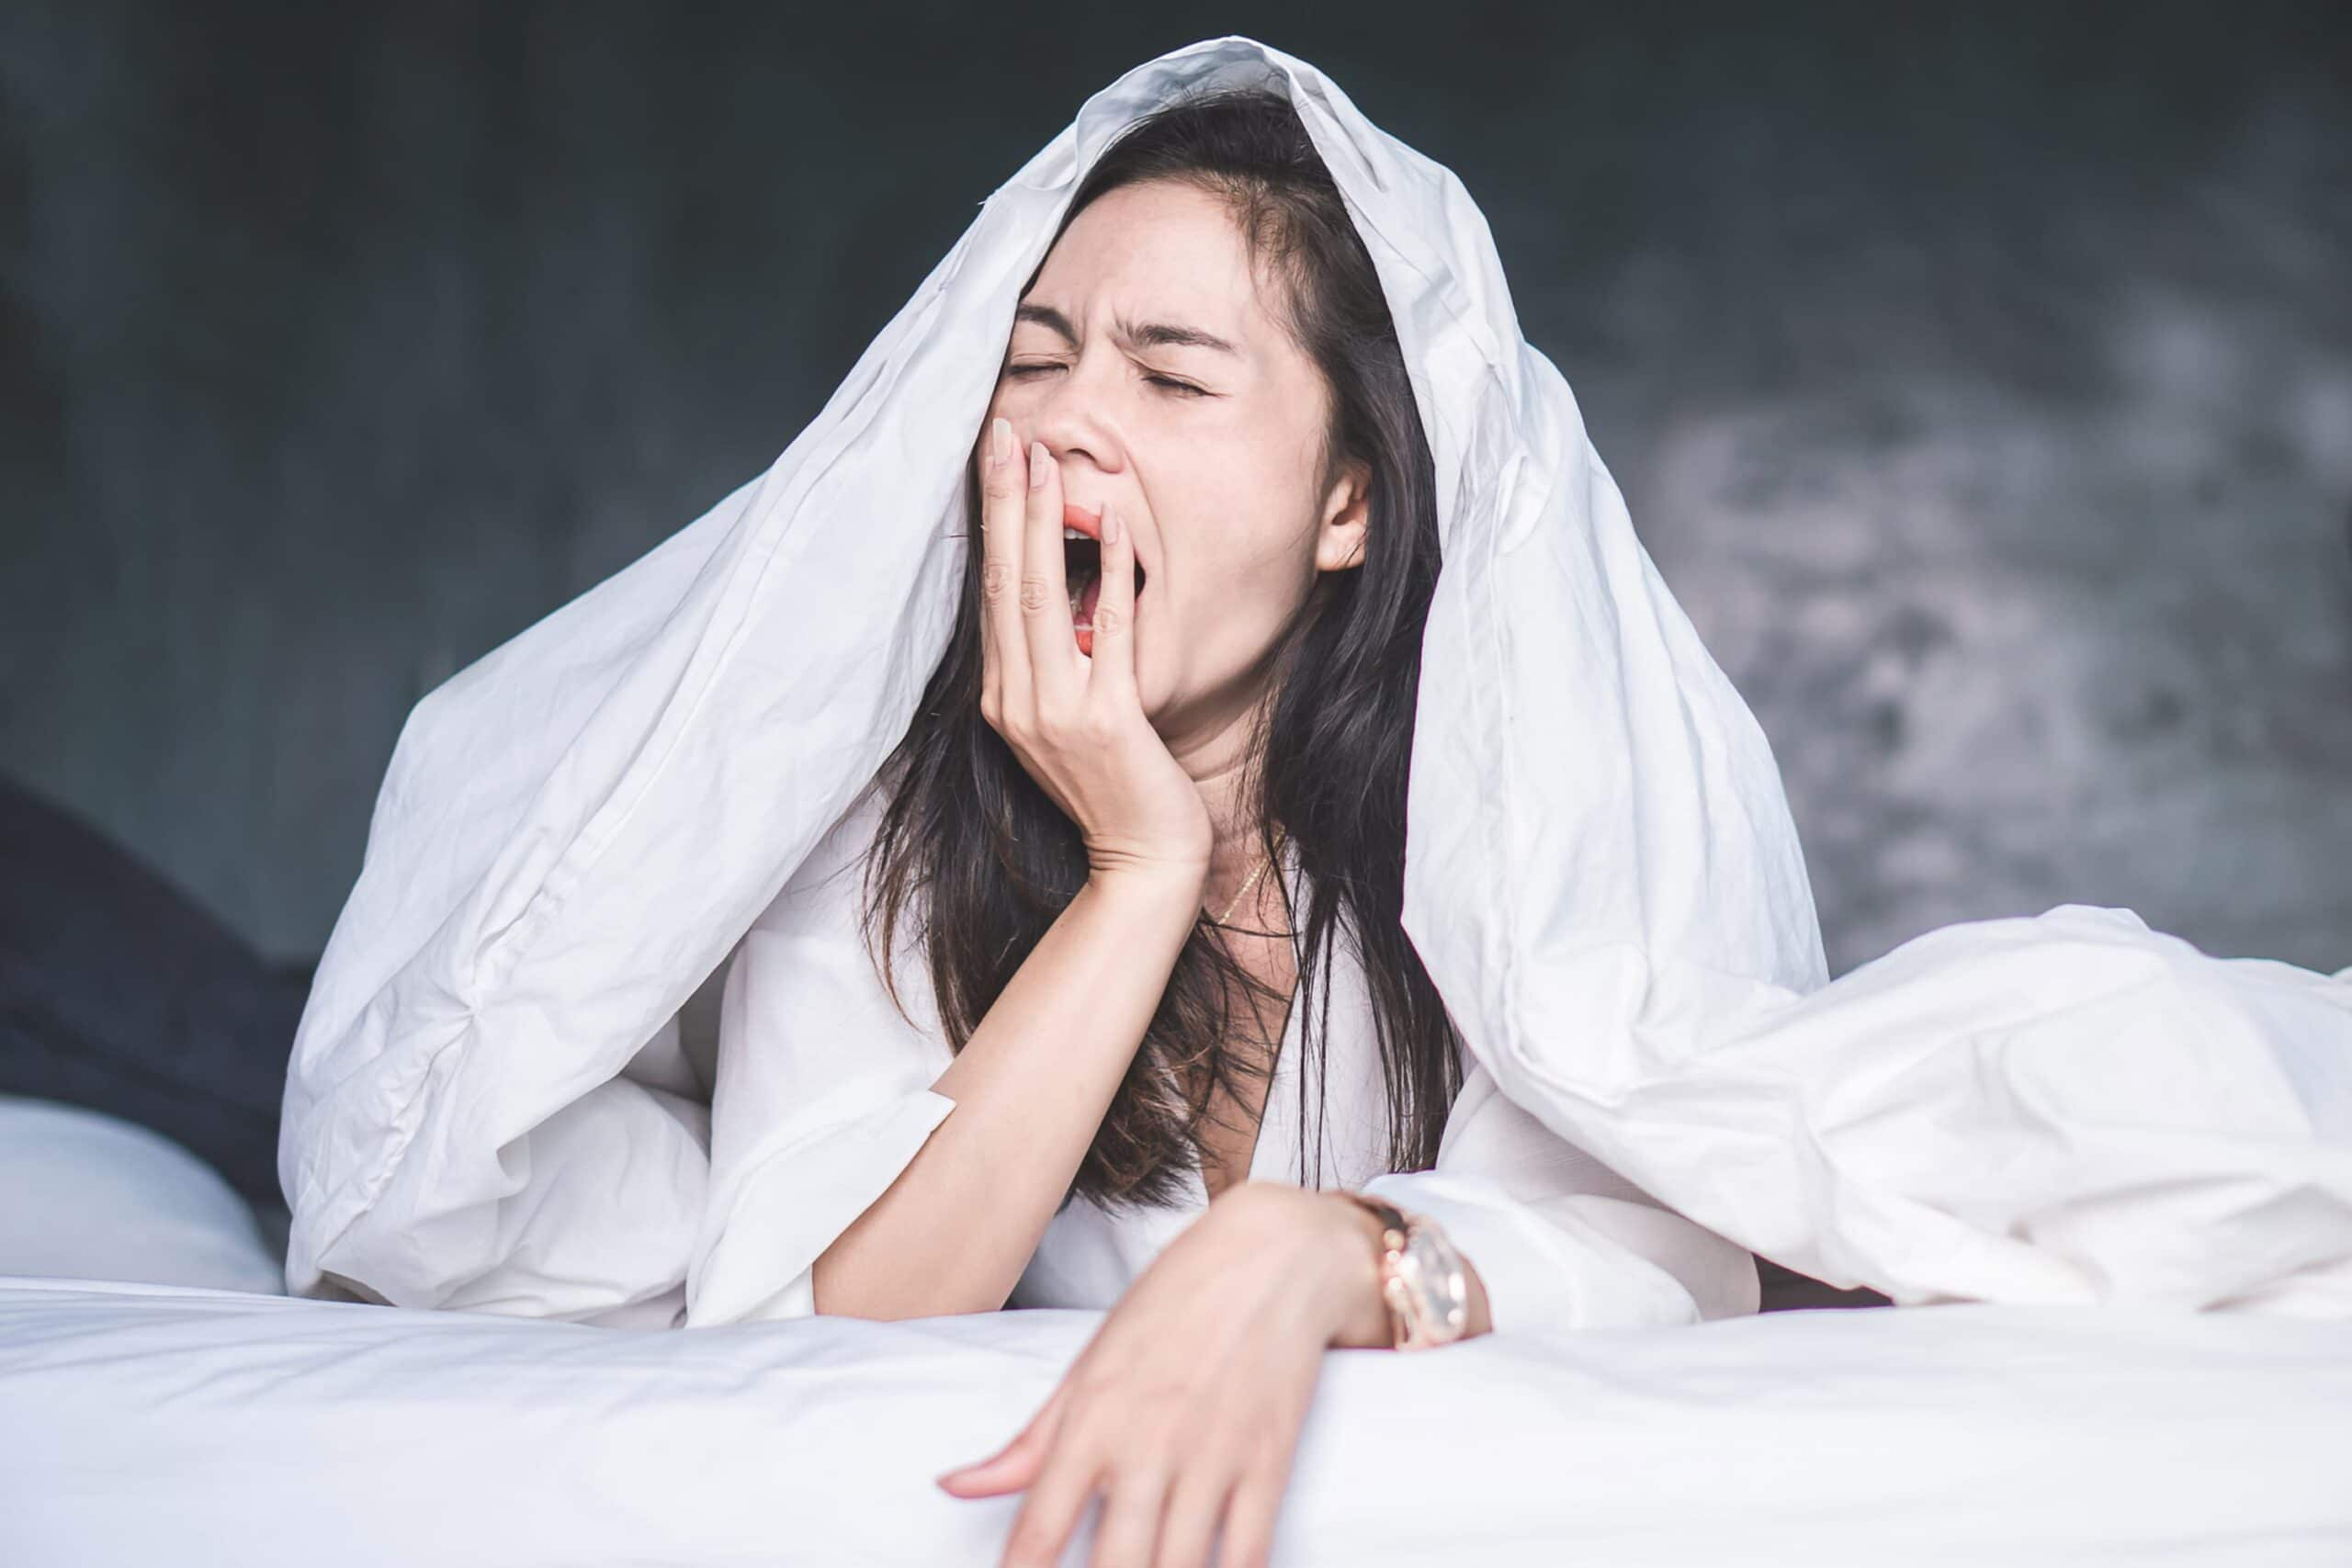 How Can You Get into a deep sleep